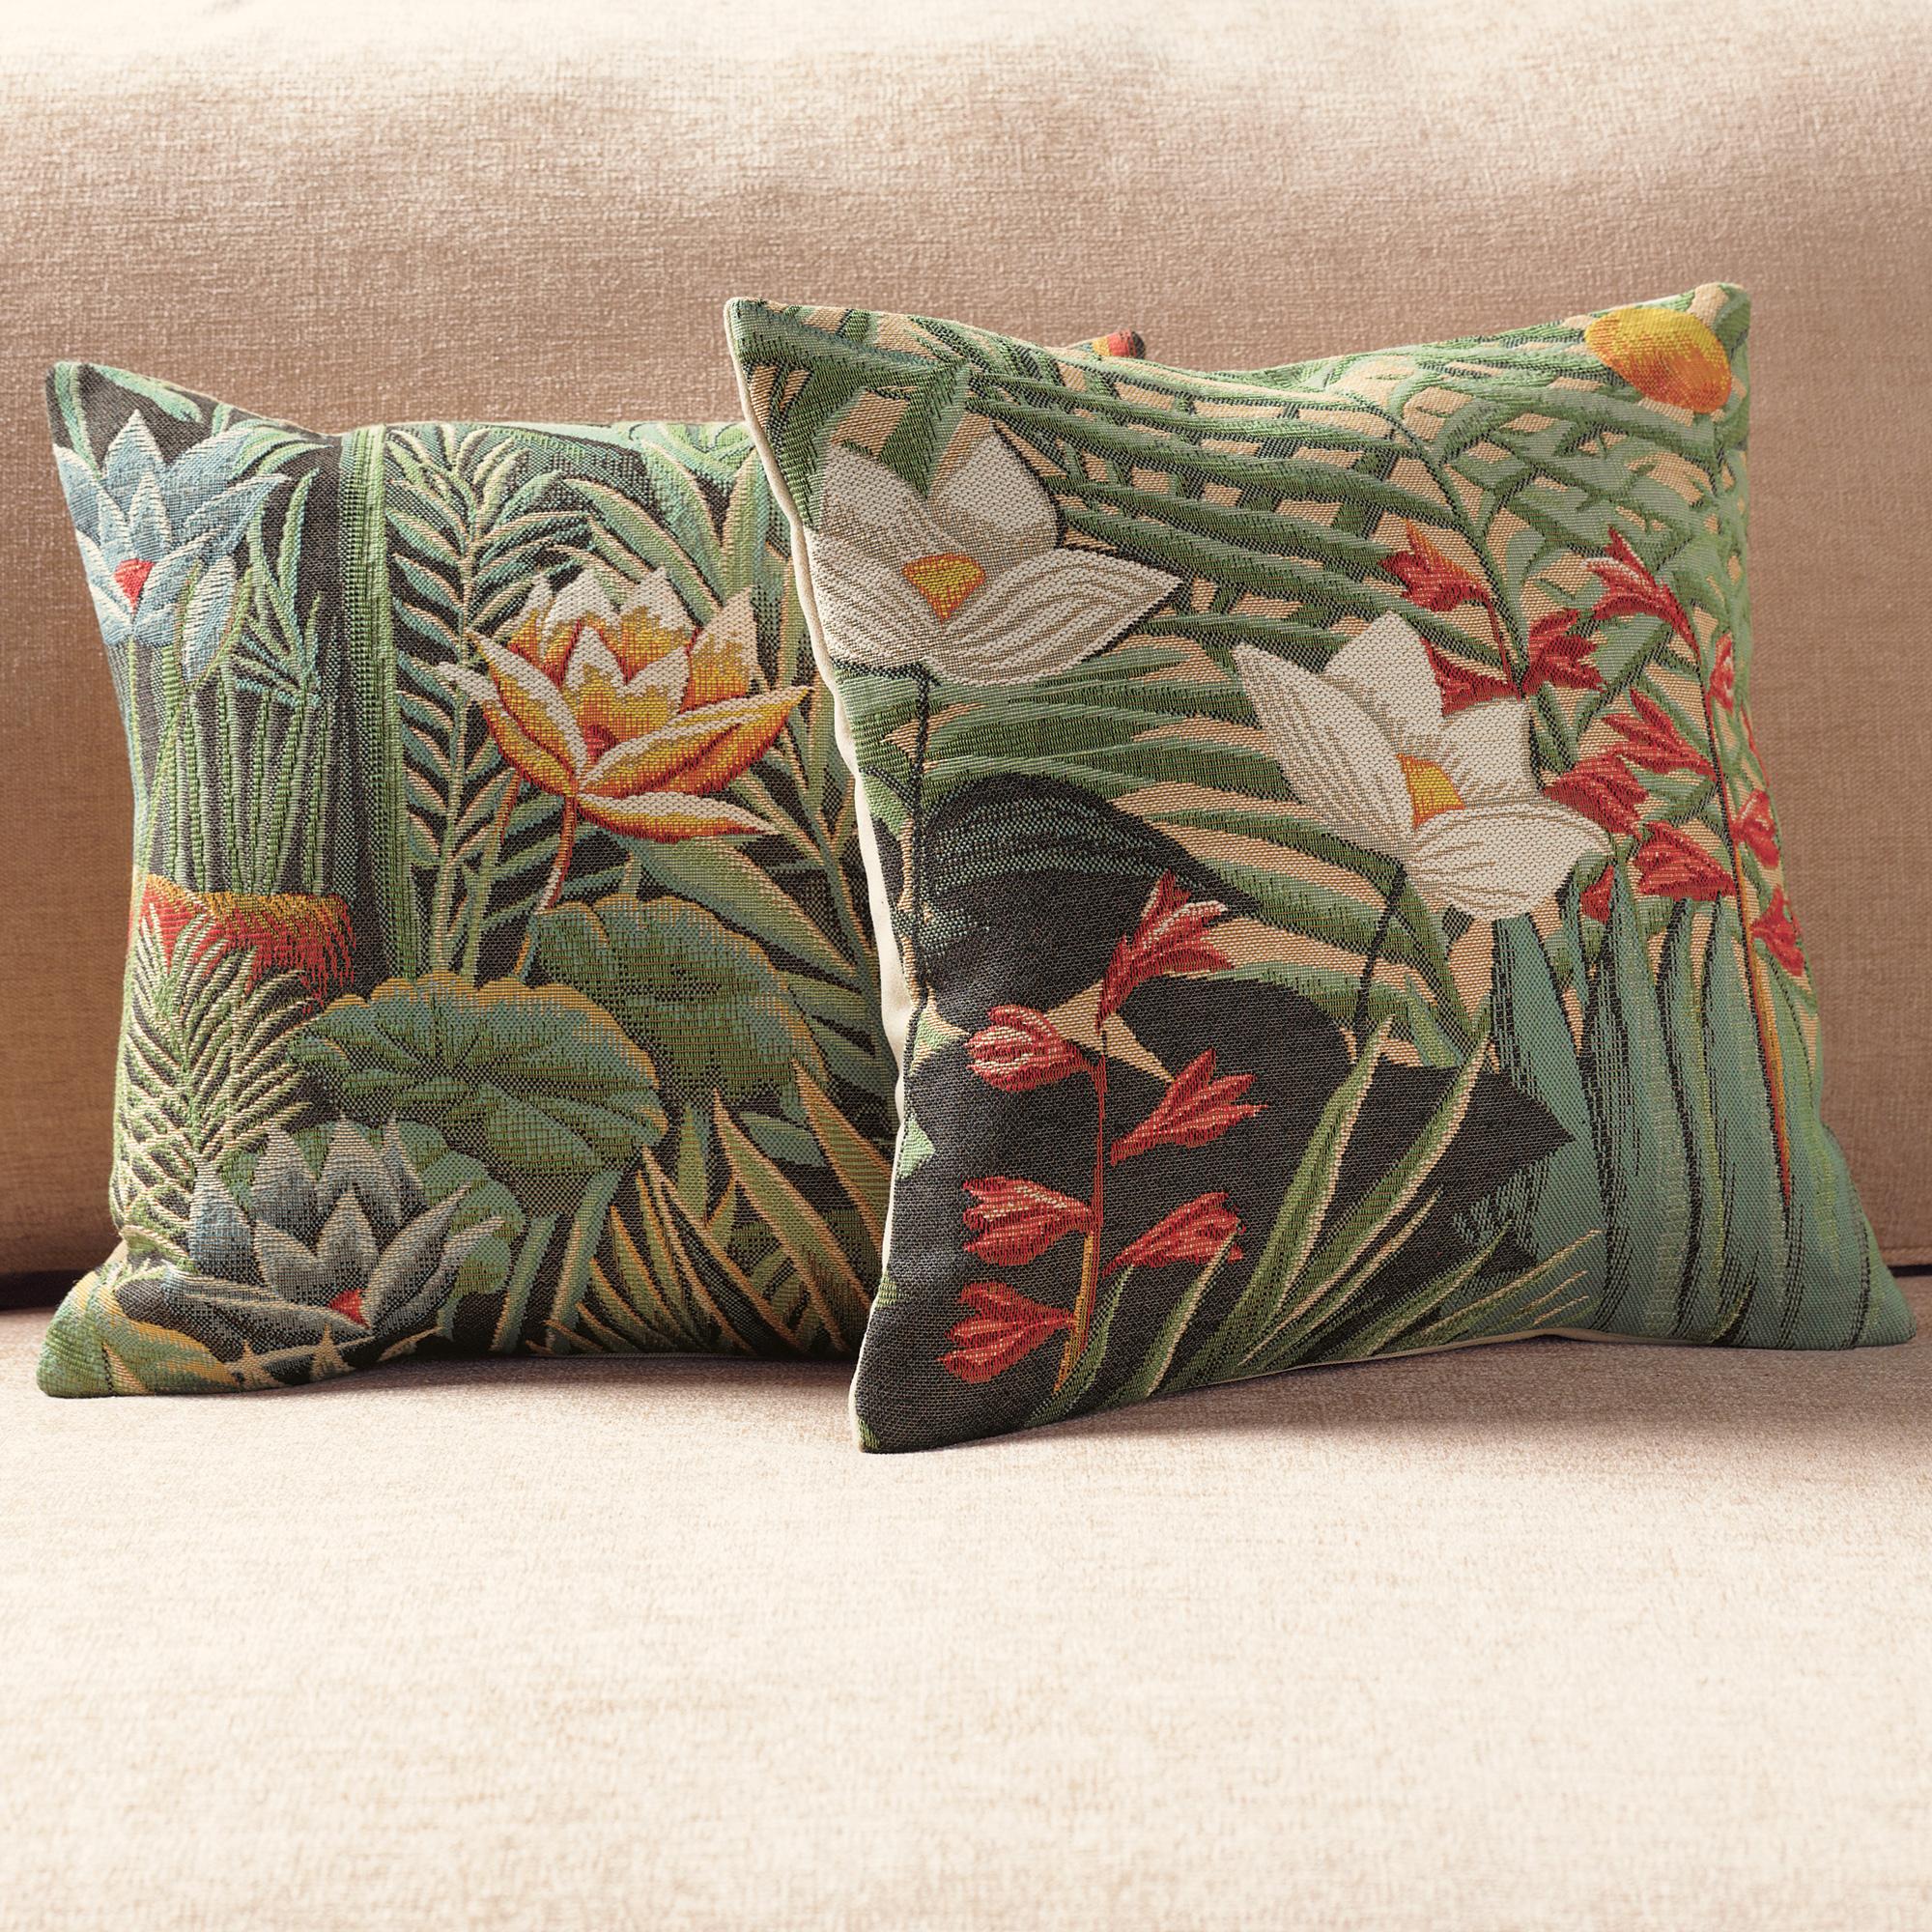 Throw Pillows Home : Rousseau Lotus Pillows Gump s